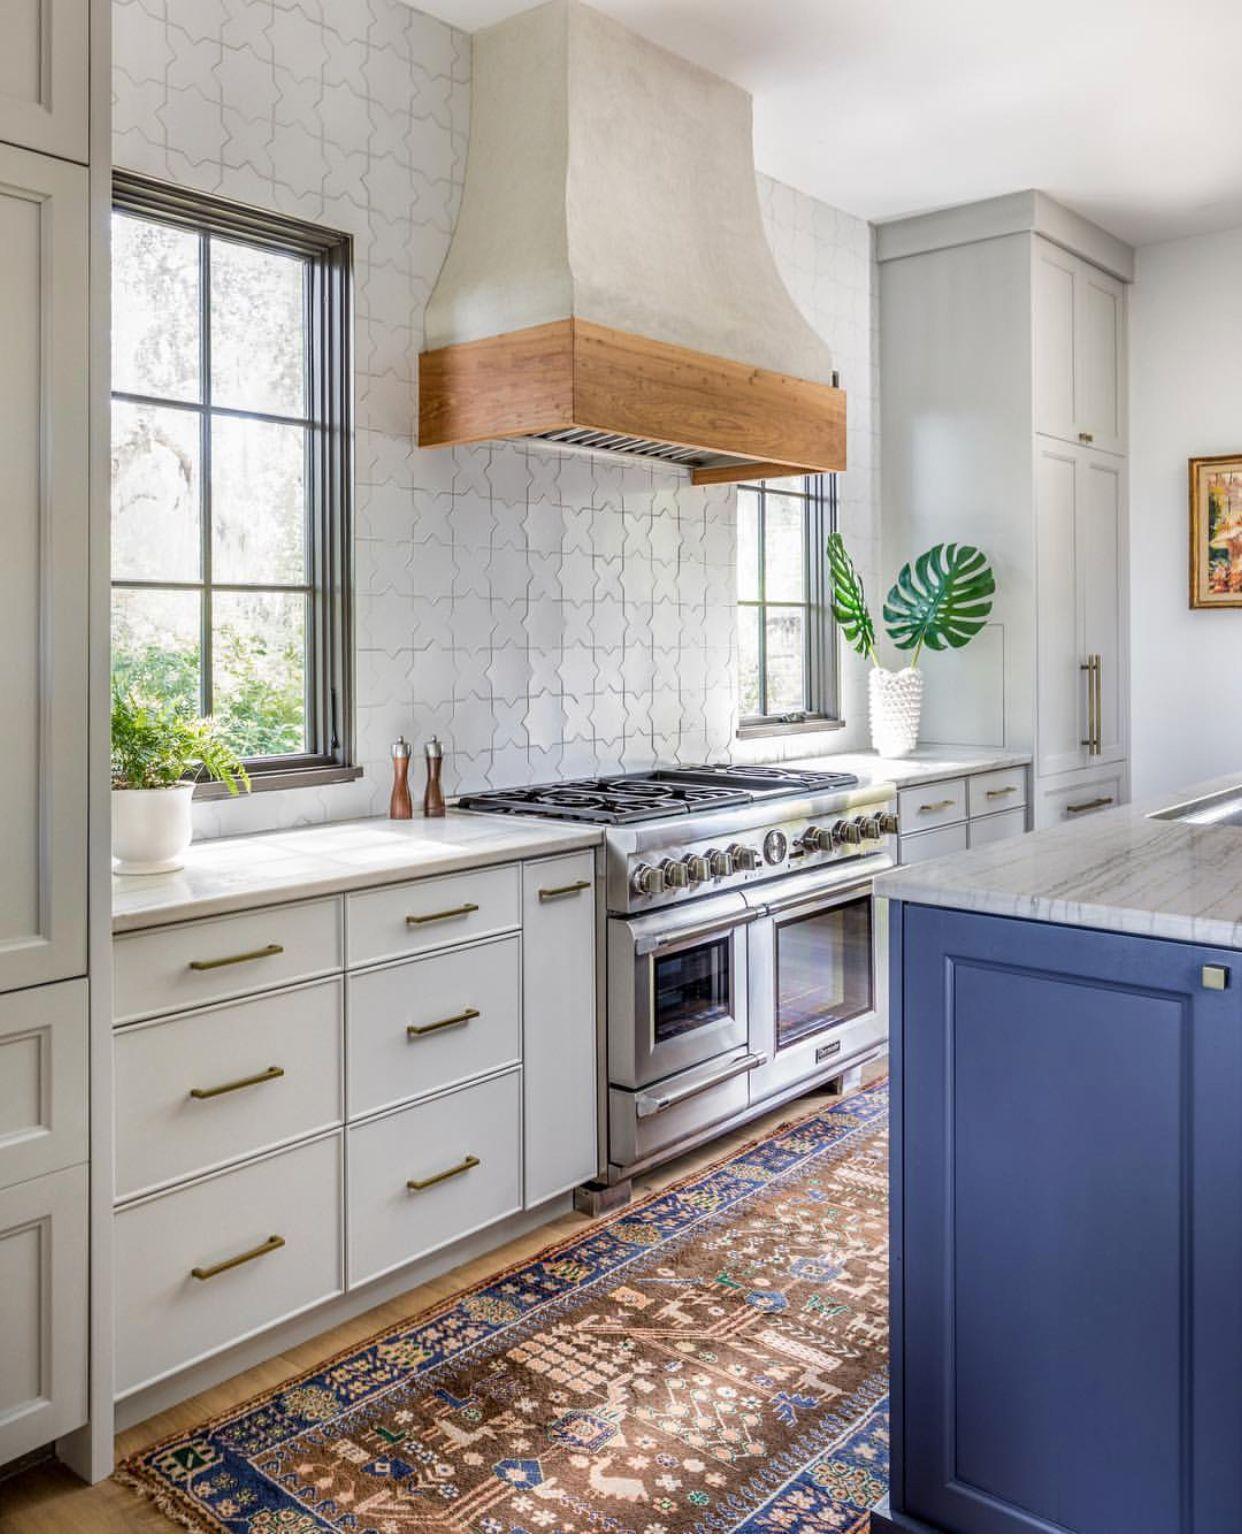 archetype interior design kitchen range hood full wall backsplash tile drawer frames kitchen on kitchen interior tiles id=80619